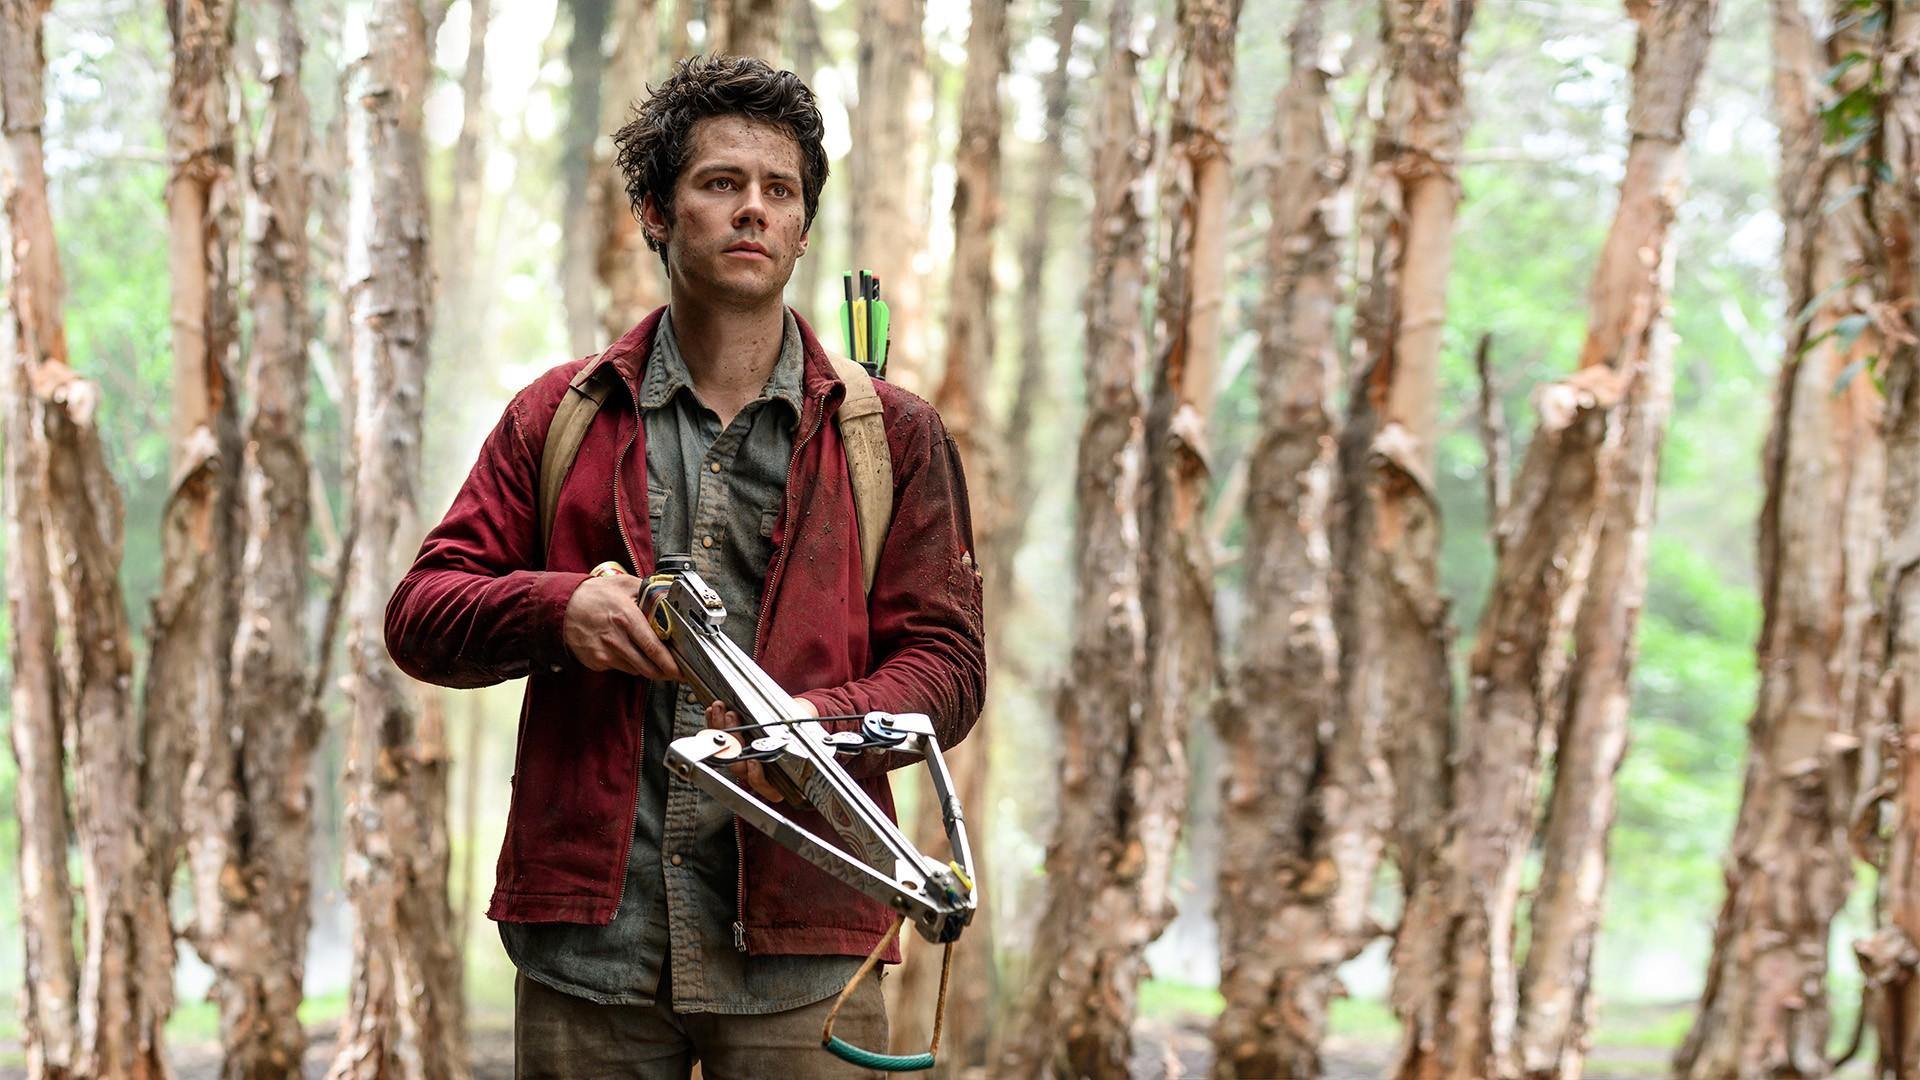 «Love and Monsters»: Ένα love story επιστημονικής φαντασίας με έντονα στοιχεία κωμωδίας που αξίζει να δεις τώρα Μια ταινία που απευθύνεται σε όλους τους fans της σειράς «Stranger Things» αλλά και του «Dylan O'Brien». Και όχι μόνο σε αυτούς...  Μια ταινία για όλους, όσοι εκτιμούν το έξυπνο χιούμορ και ψαχνουν ένα παραθυράκι απόδρασης από την πραγματικότητα.